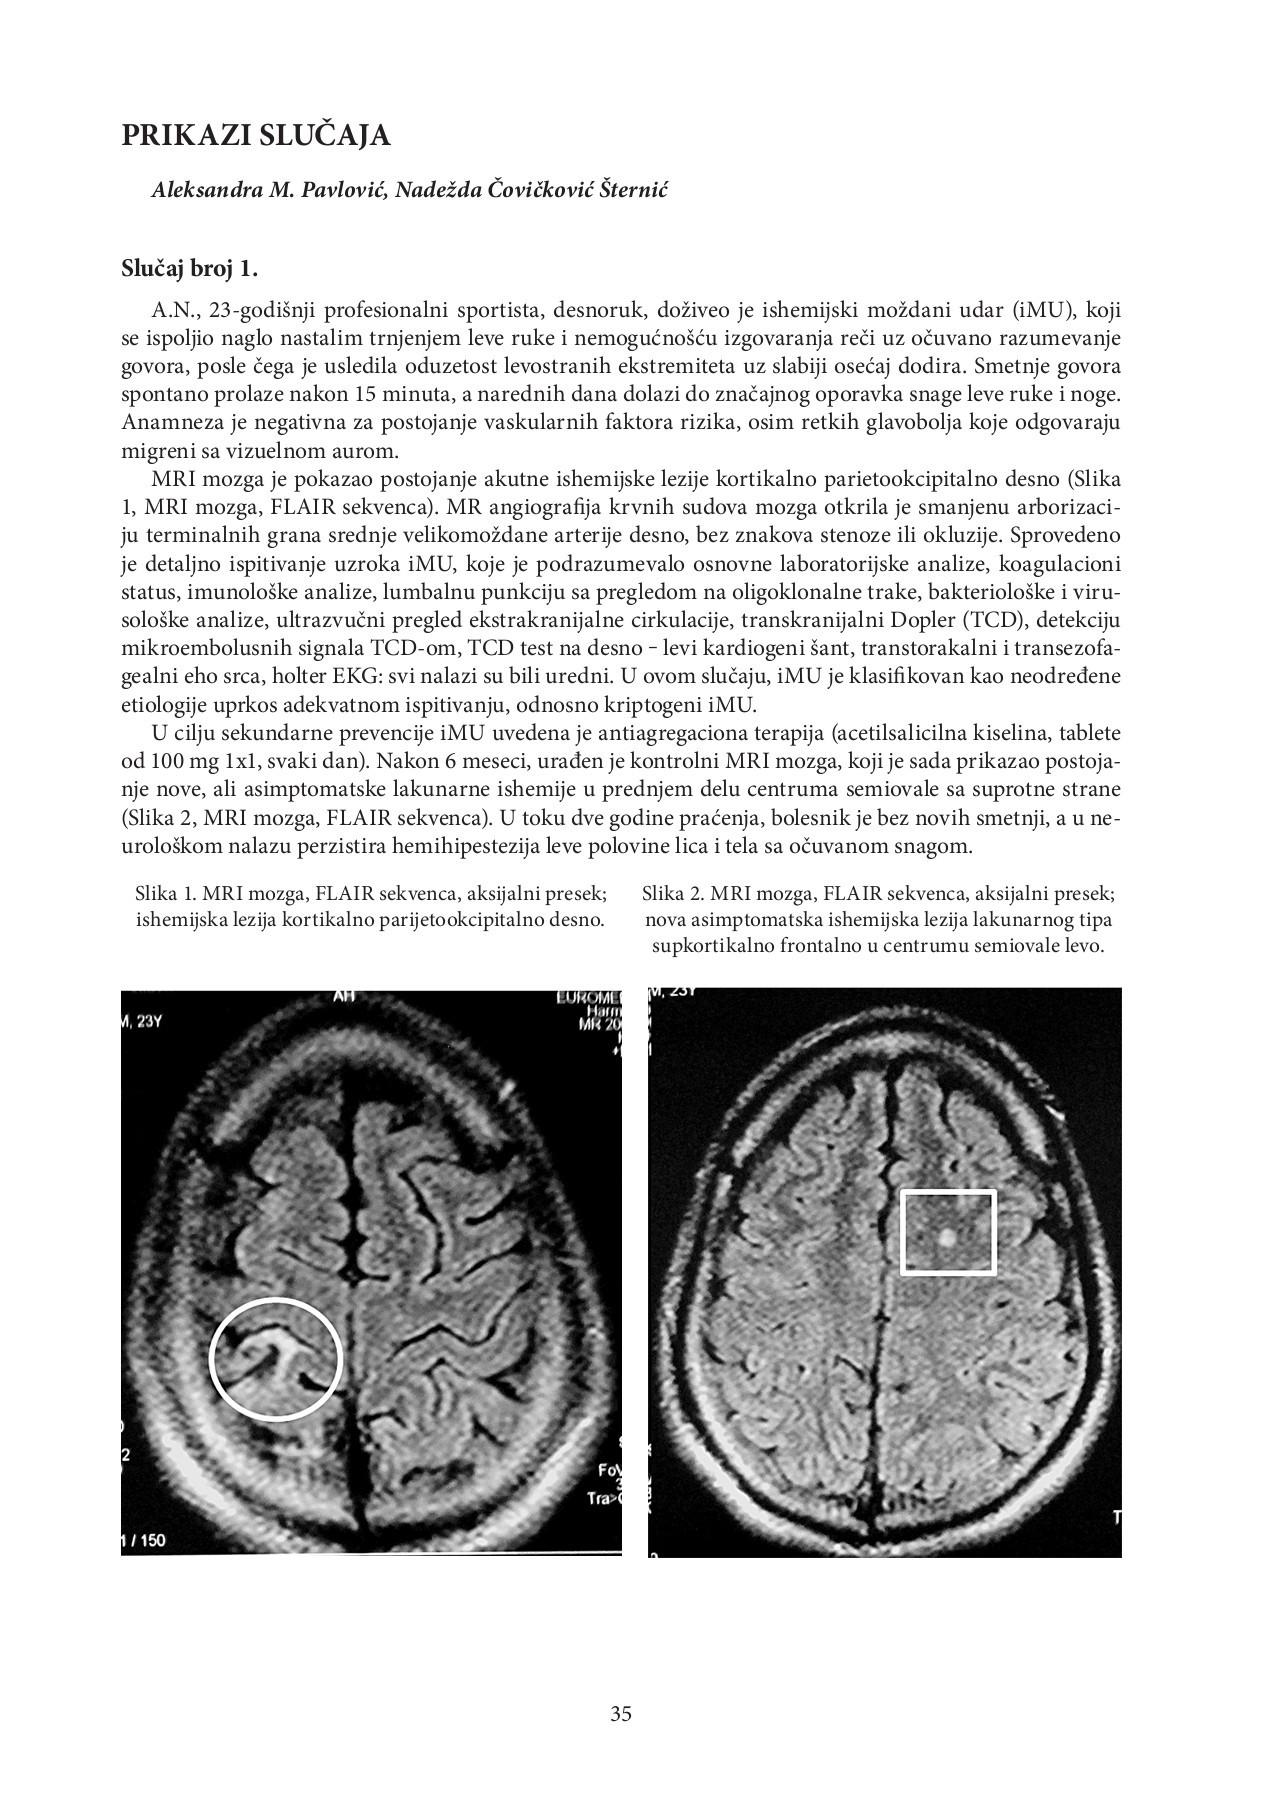 hipertenzija mri mozga